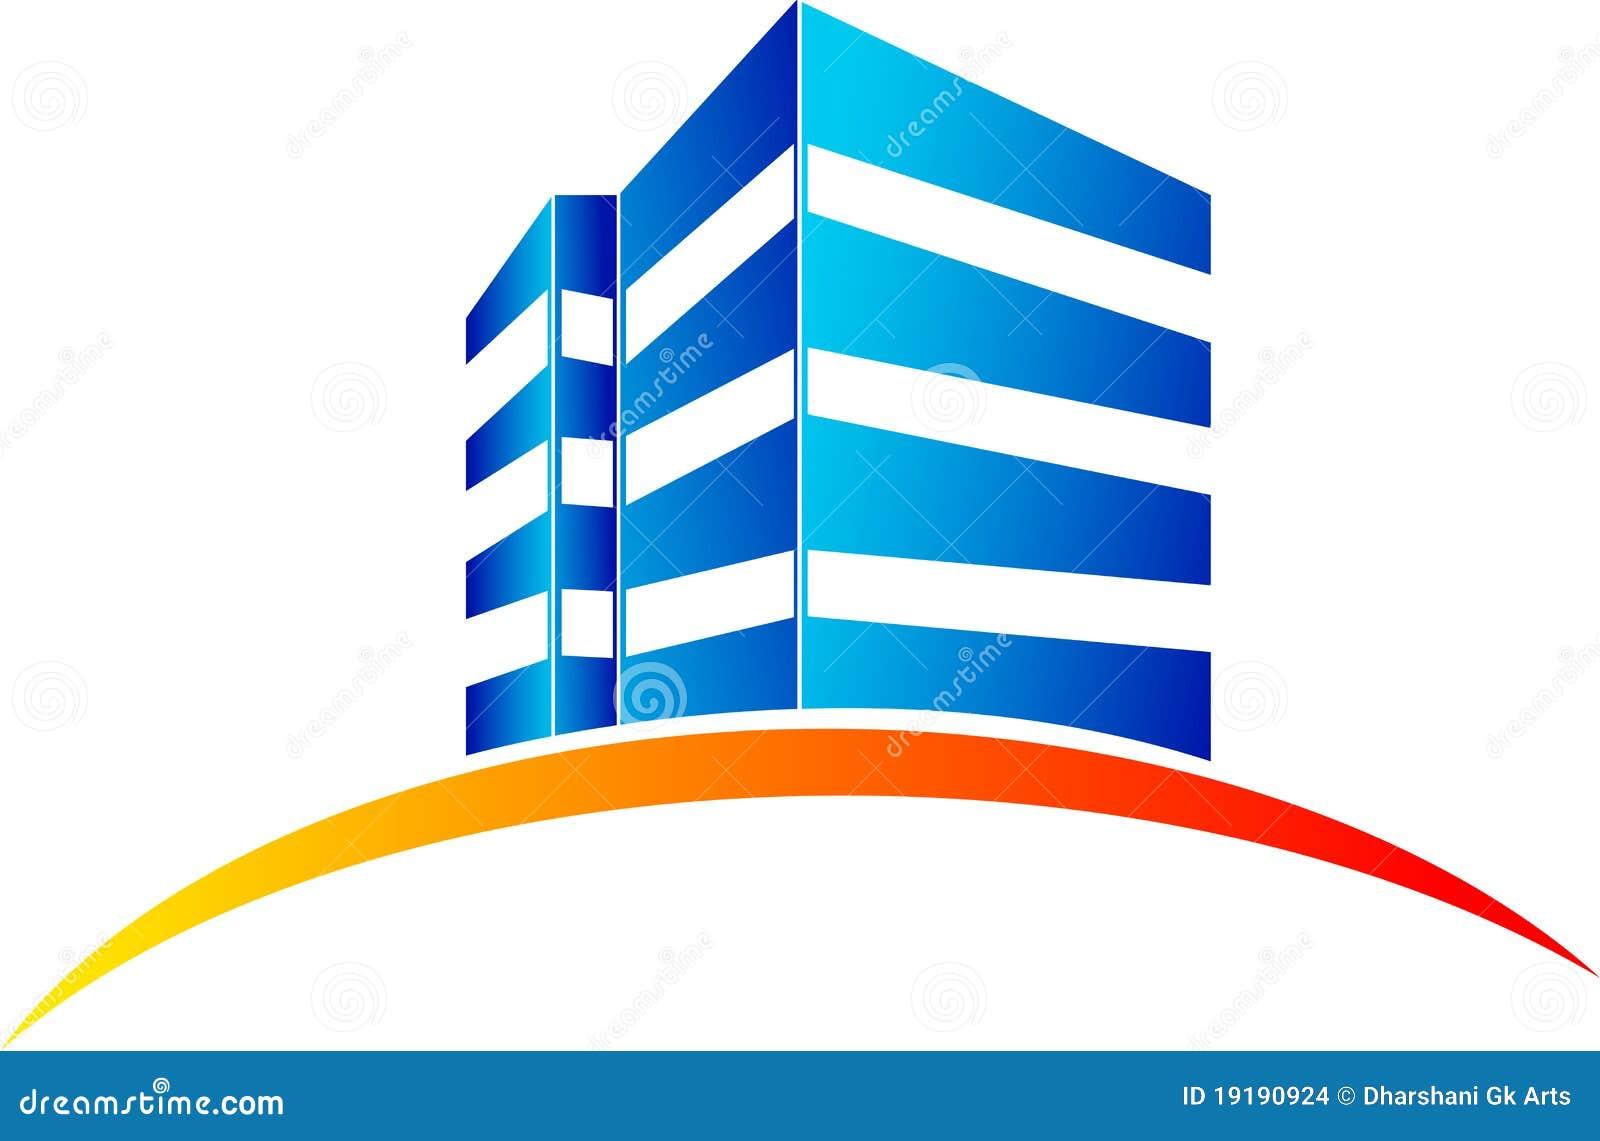 Building Construction Graphics : Building logo stock vector illustration of ncity